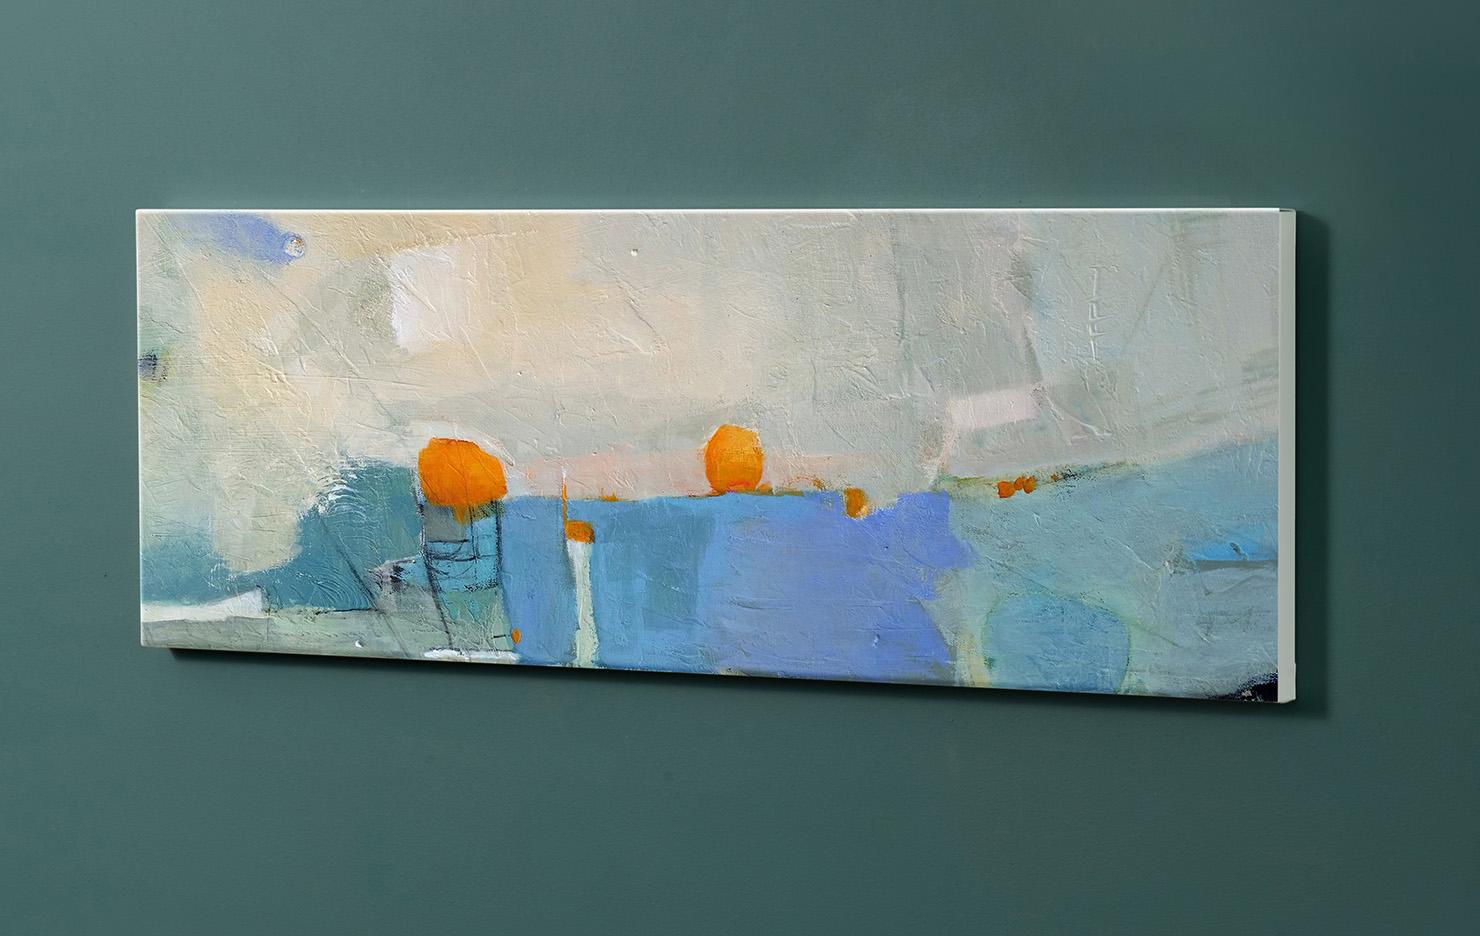 Magnettafel NOTIZ 90x30cm Motiv-Pinnwand M163 Abstrakt Kunst